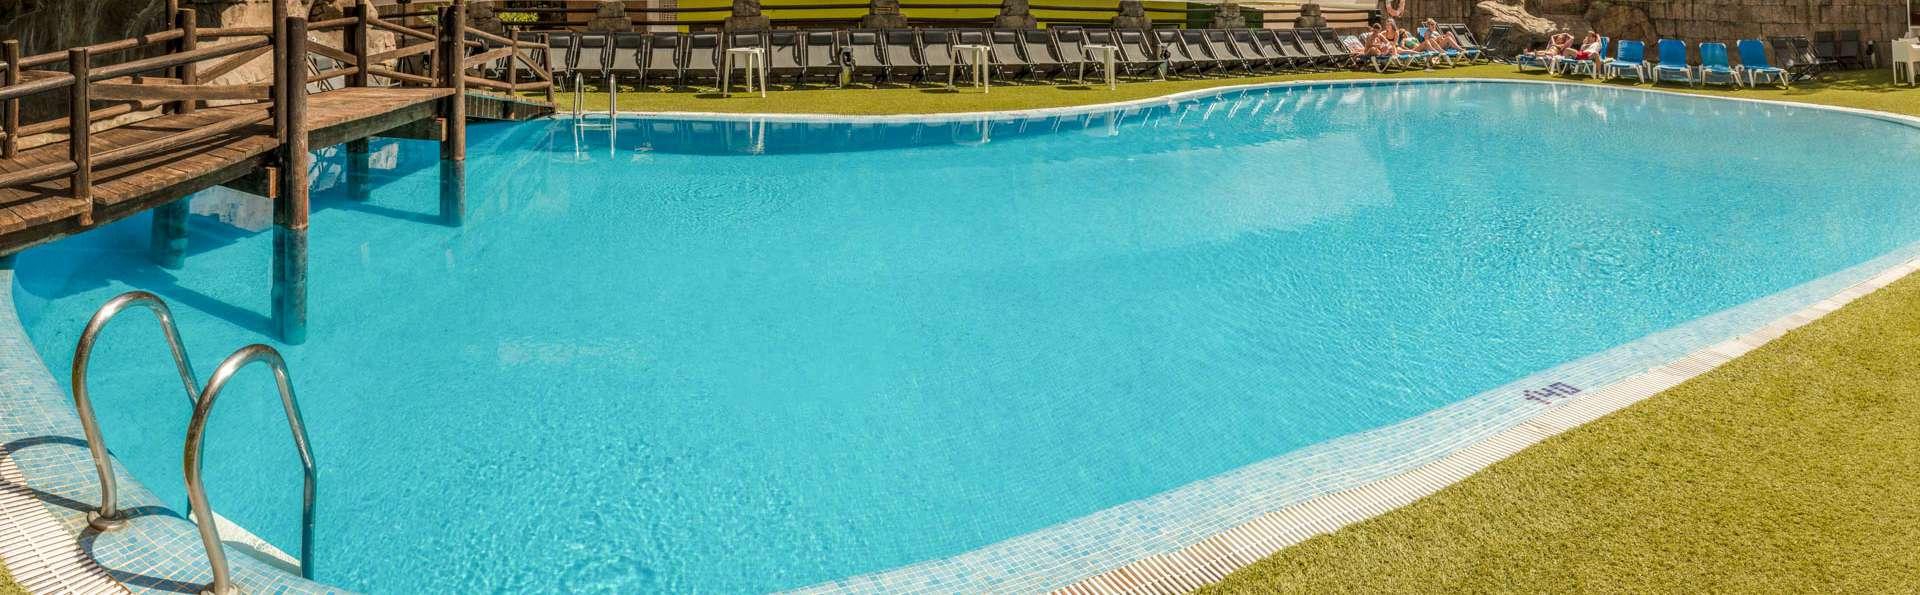 Benidorm Celebrations Pool Party Resort - EDIT_POOL_03.jpg